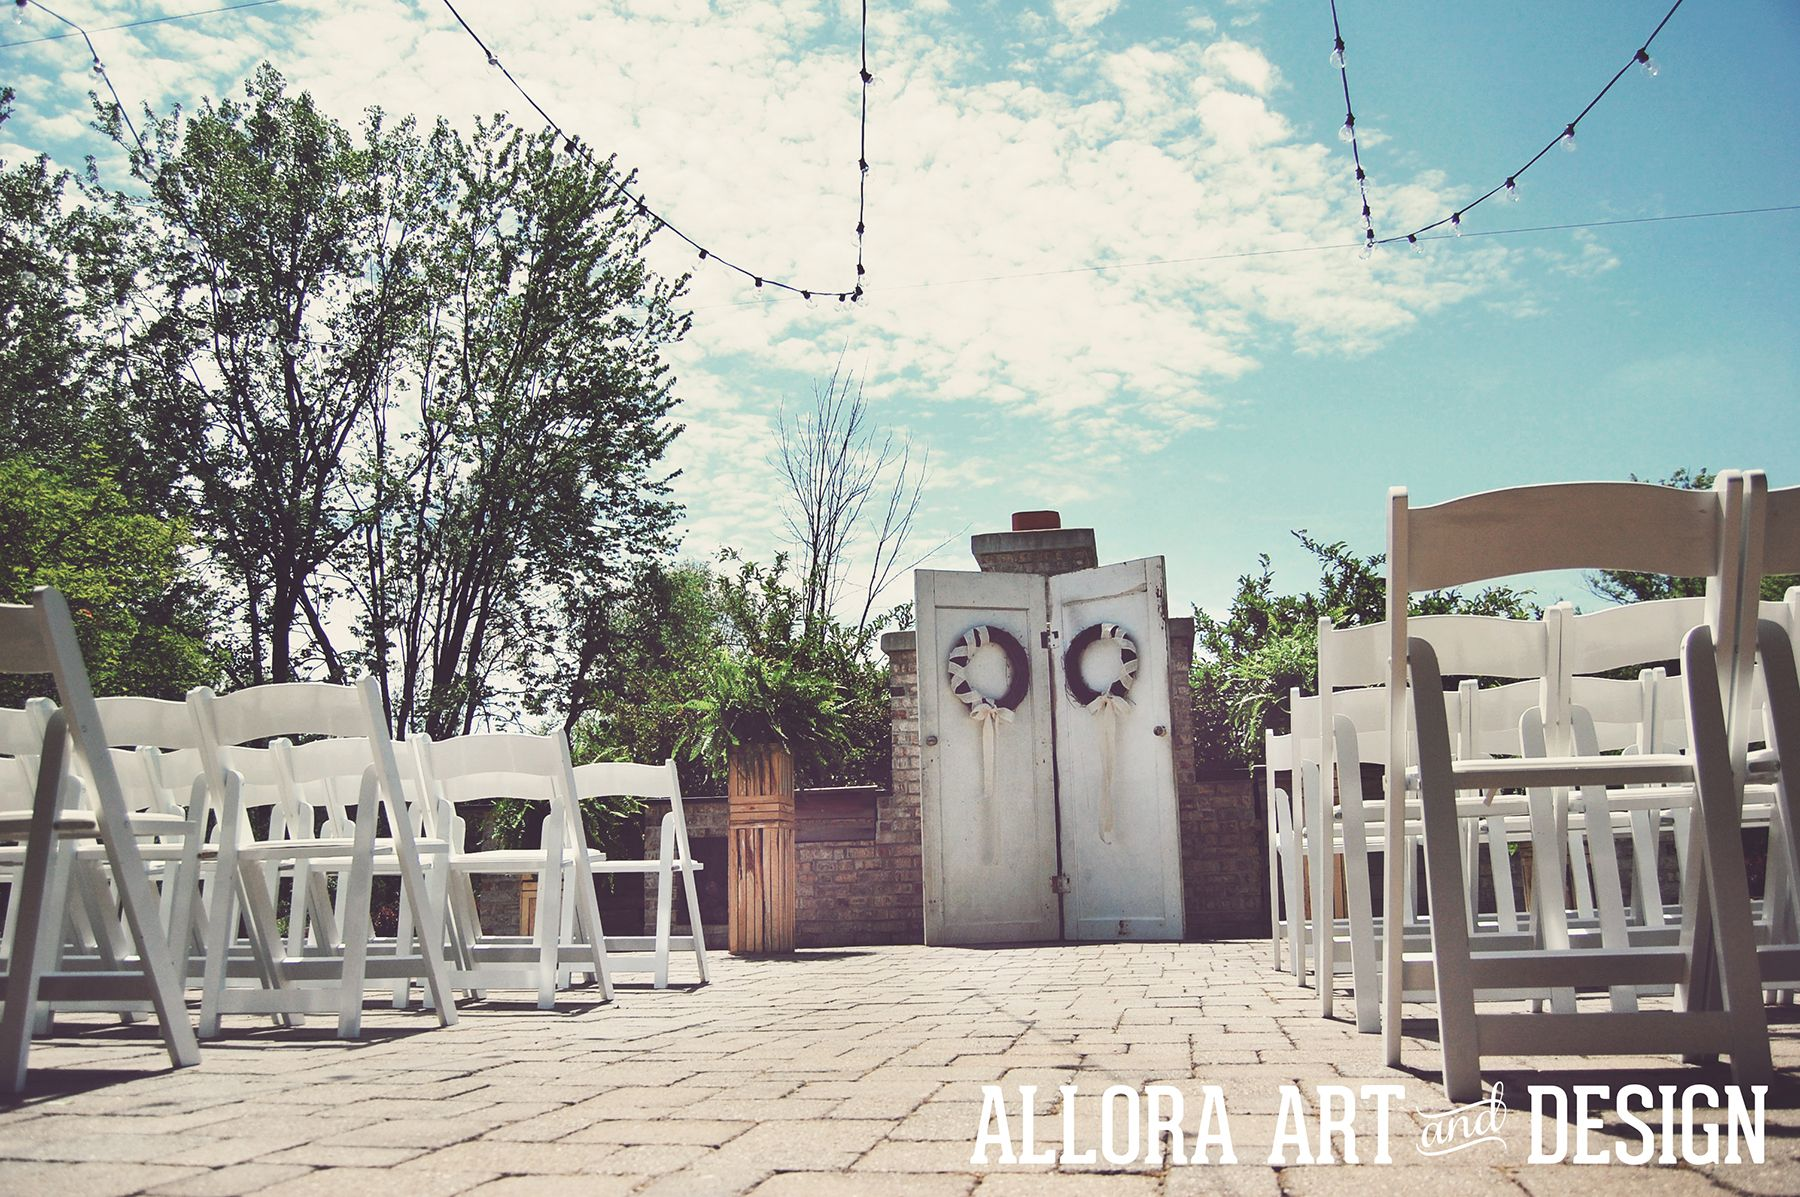 wedding photography by allora art and design  venue: fenton winery & brewery fenton, michigan  ::::::::::::::::::::::::::::::::::::::::::::::::::: #fenton #michigan #venue #fentonwinery #wedding #weddingphotography #alloraartanddesign